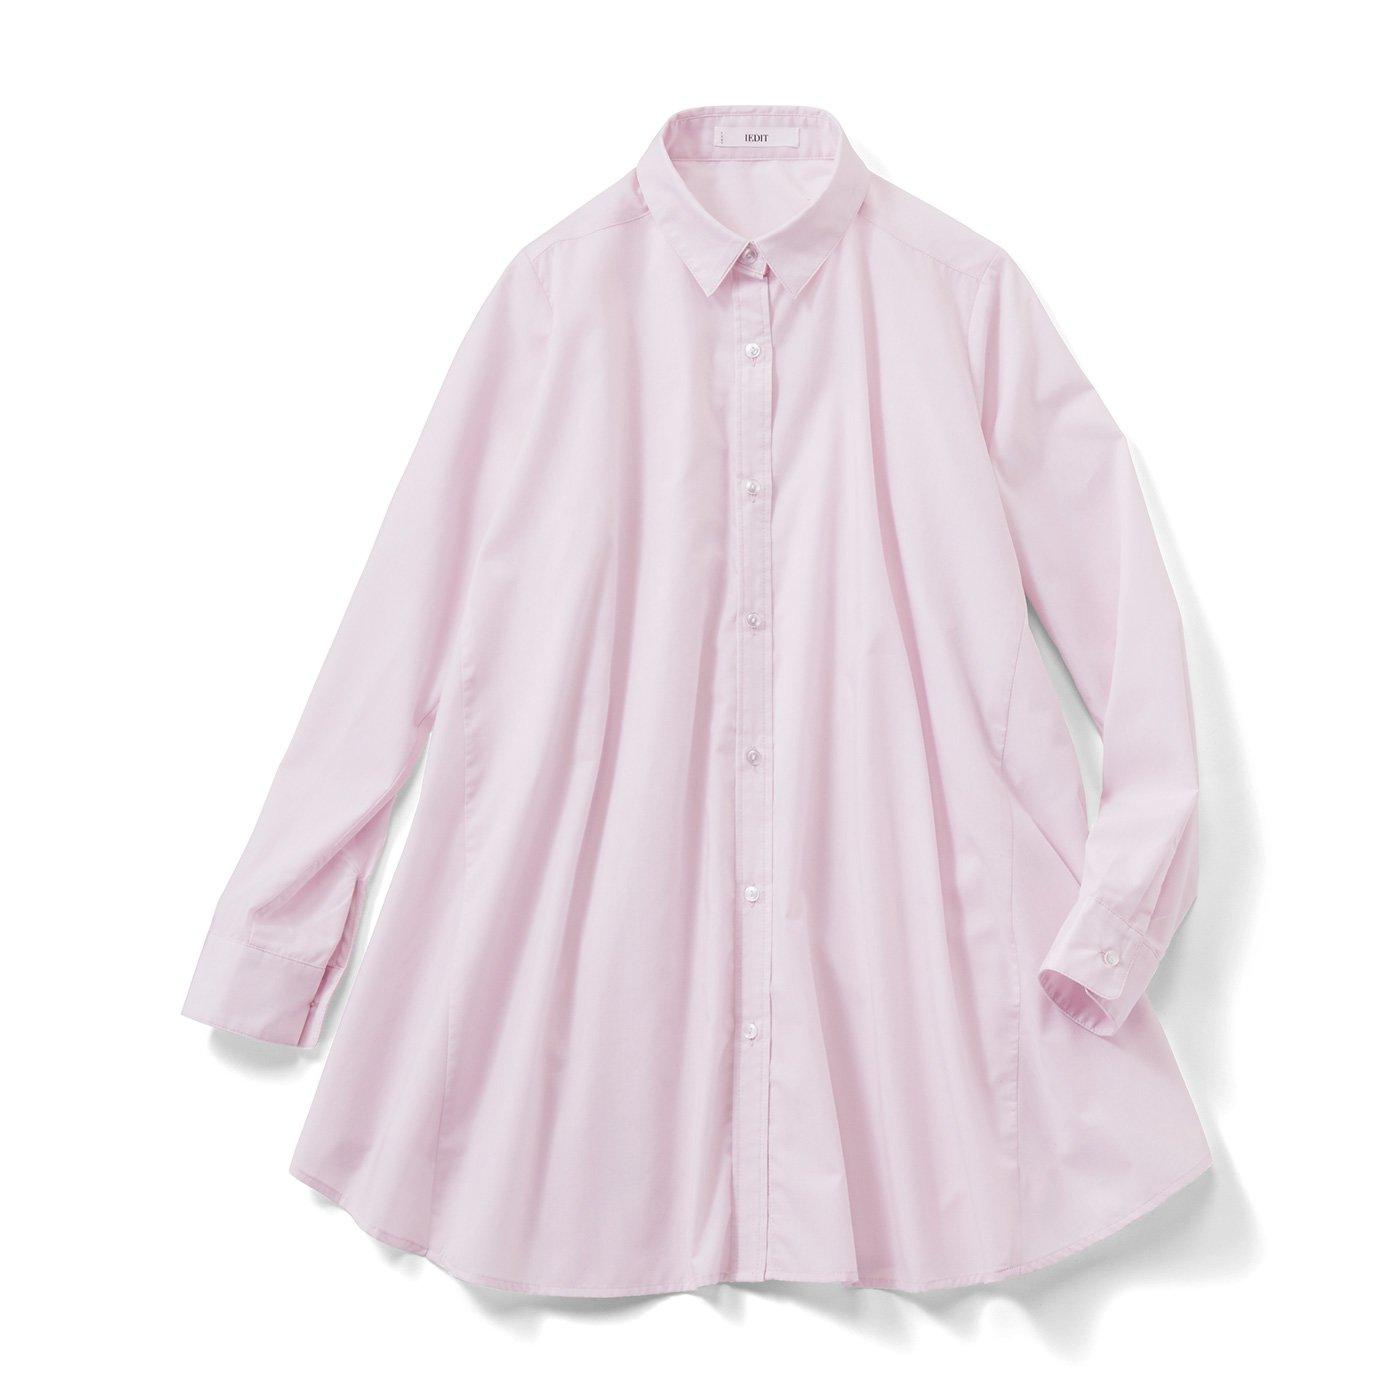 IEDIT[イディット] たっぷりフレアーが印象的なAラインシャツチュニック〈ライラックピンク〉